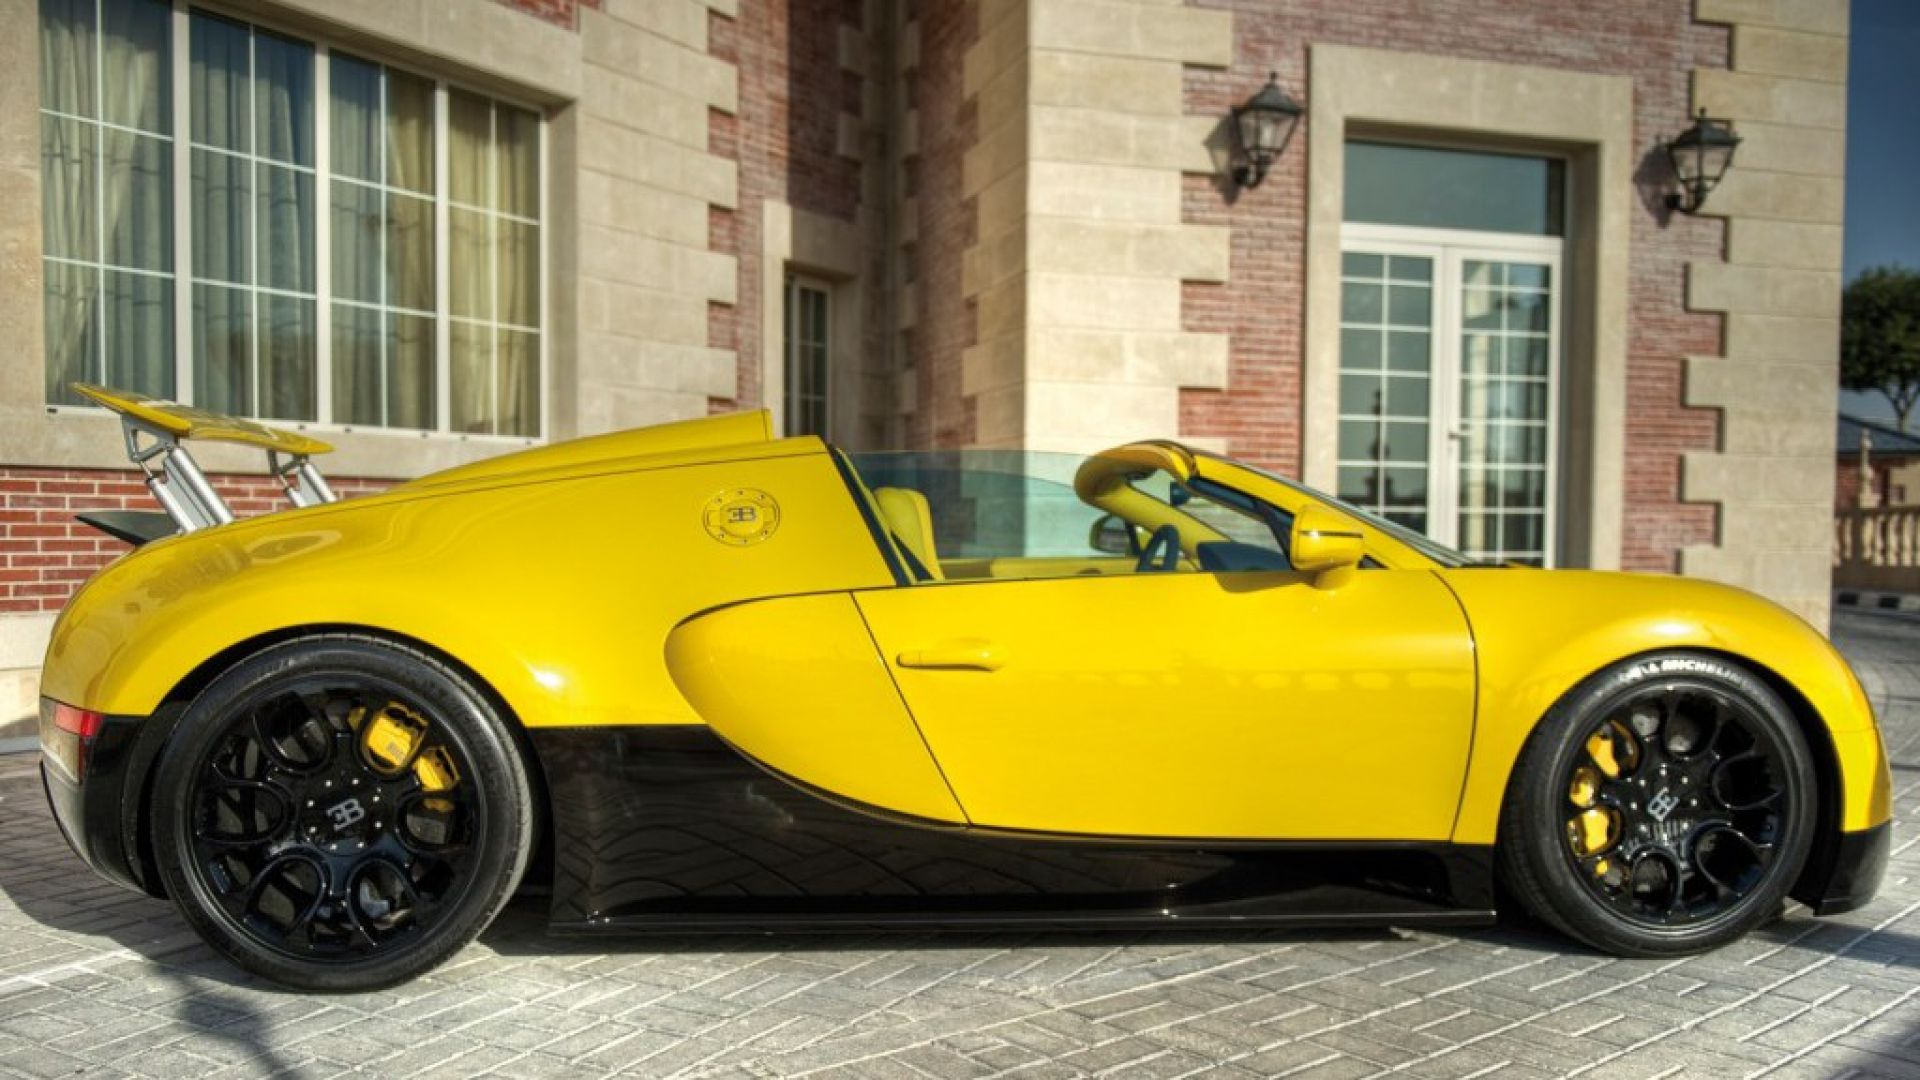 anteprima bugatti veyron grand sport one off motorbox. Black Bedroom Furniture Sets. Home Design Ideas